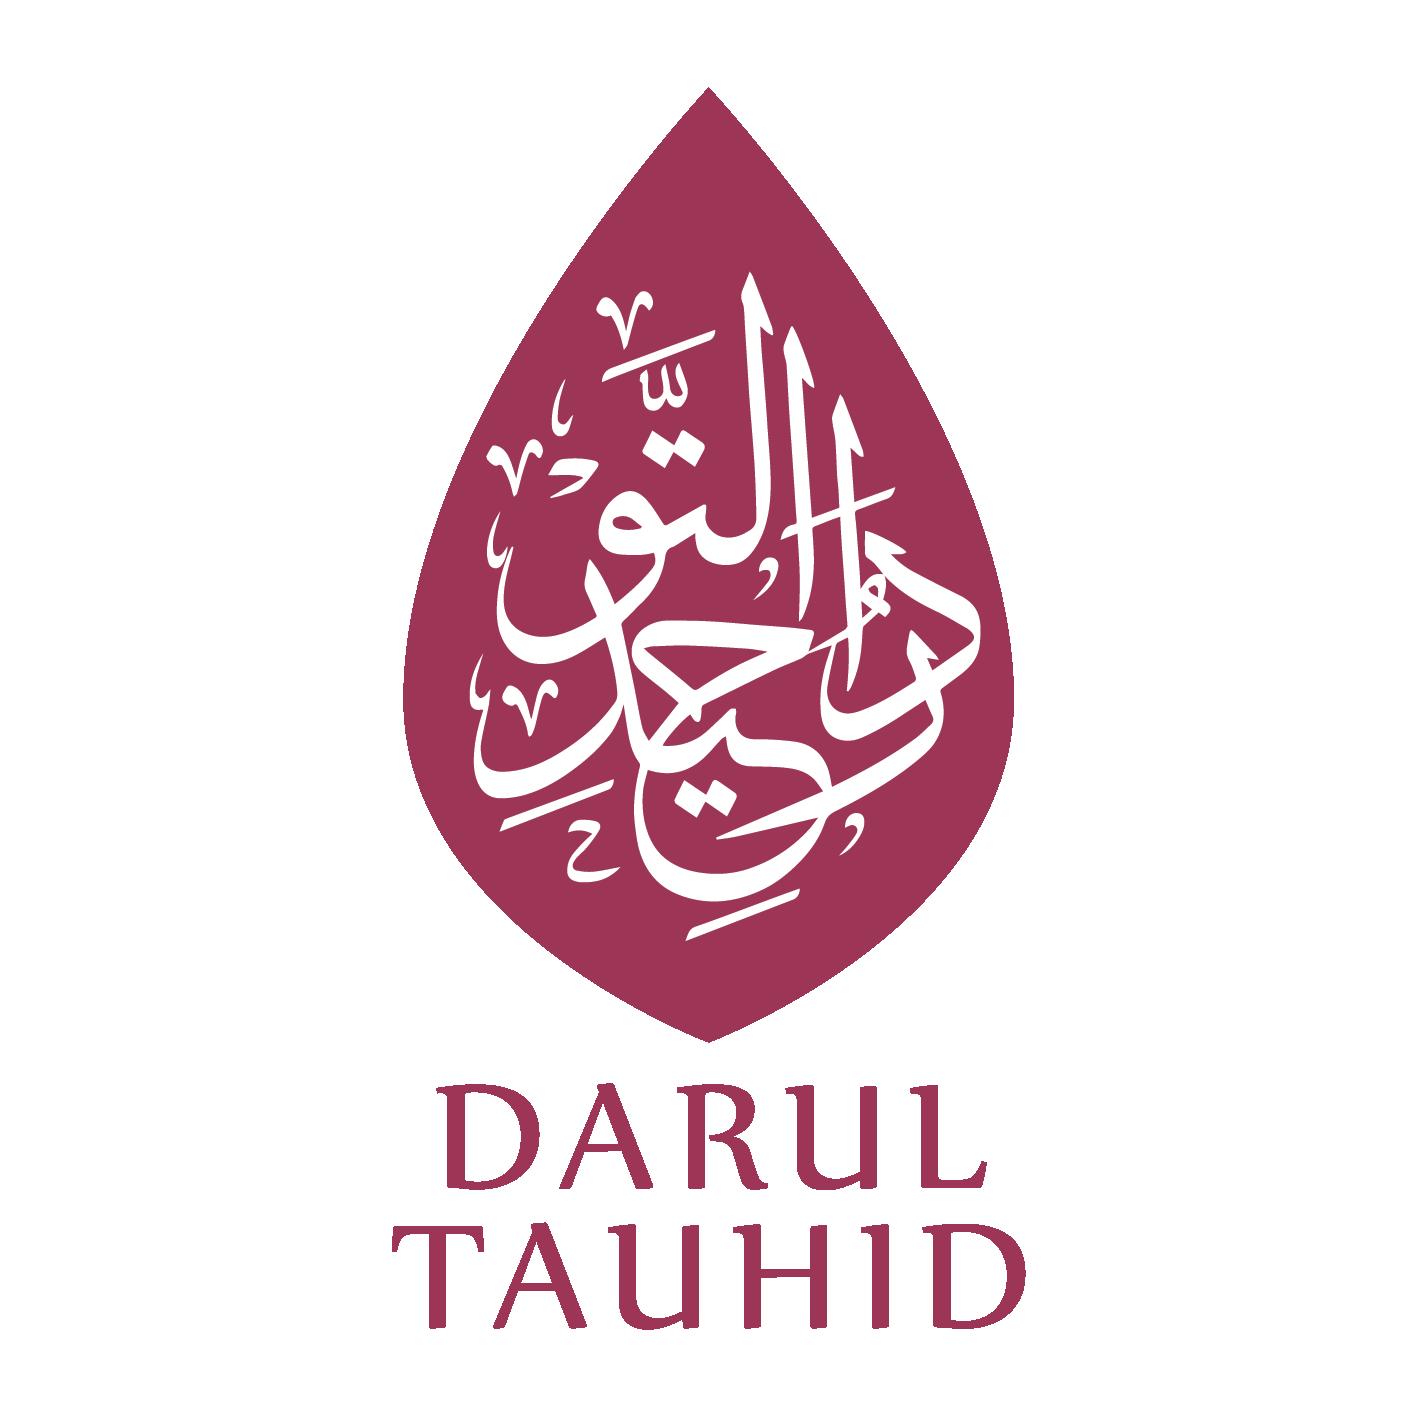 DARUL TAUHID | دار التوحيد